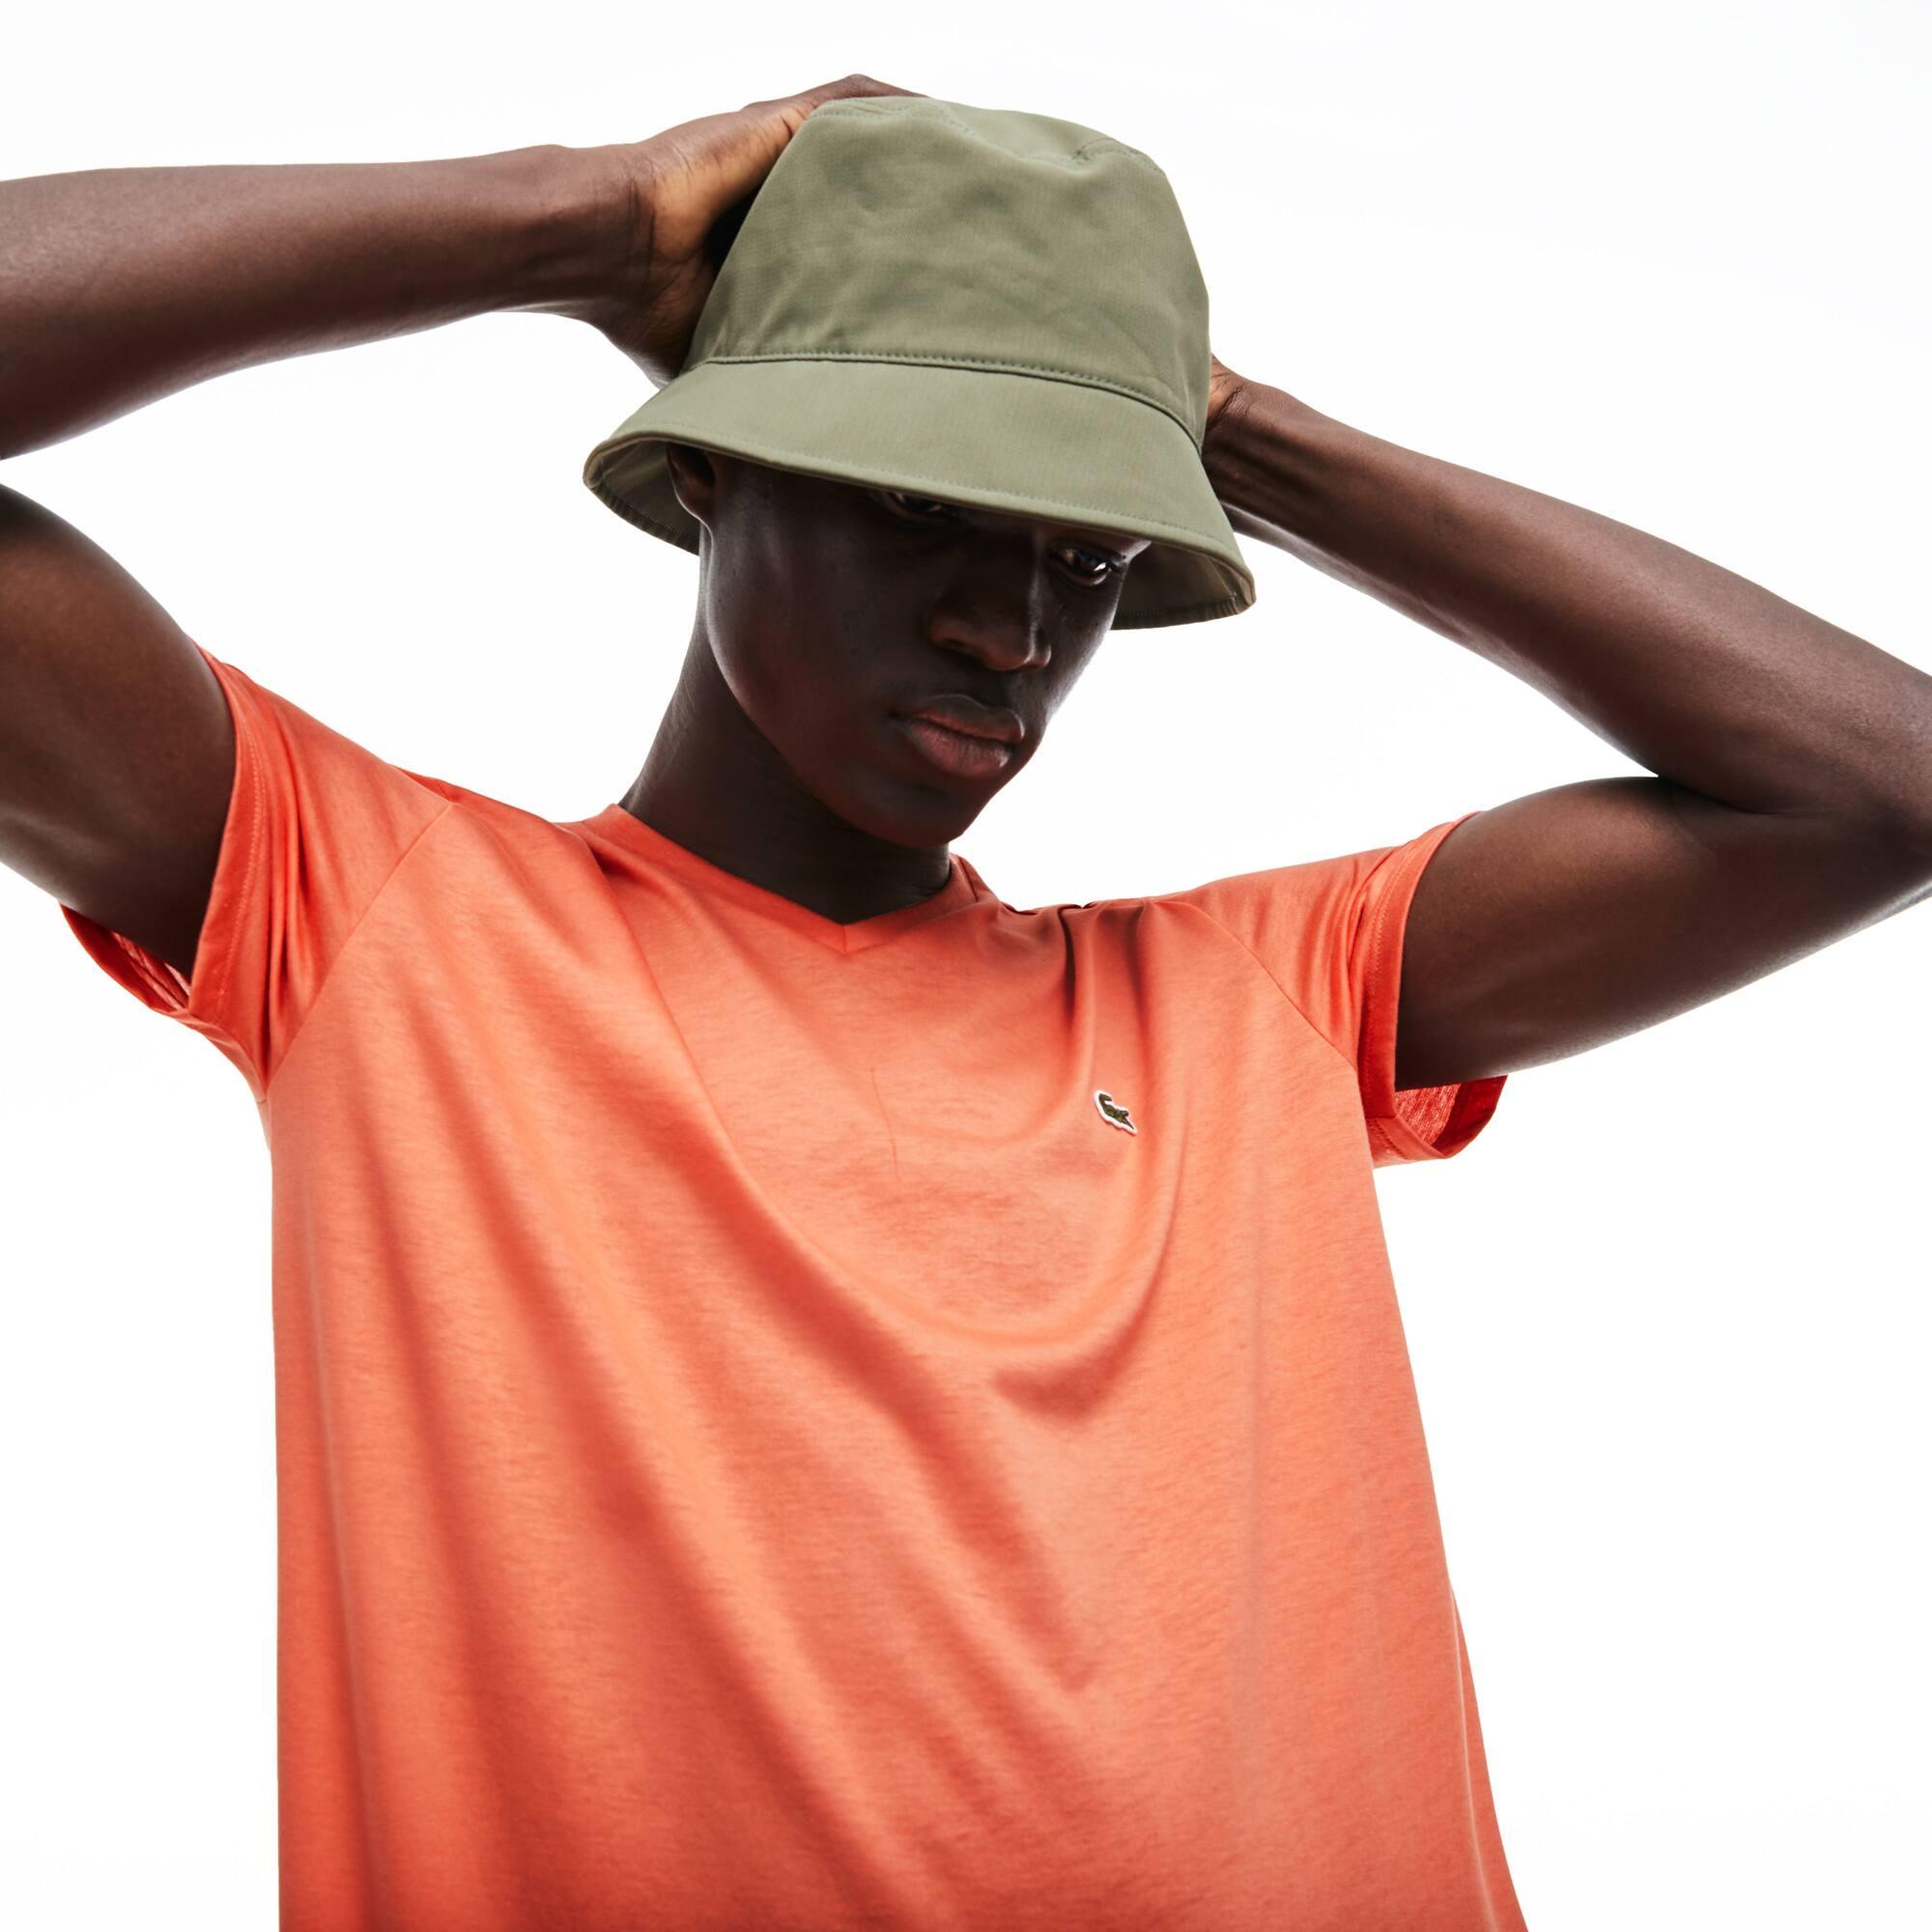 Homme T Homme Vêtements Homme Vêtements Vêtements Lacoste Shirts Shirts T Lacoste Shirts T CqBWP5Sw